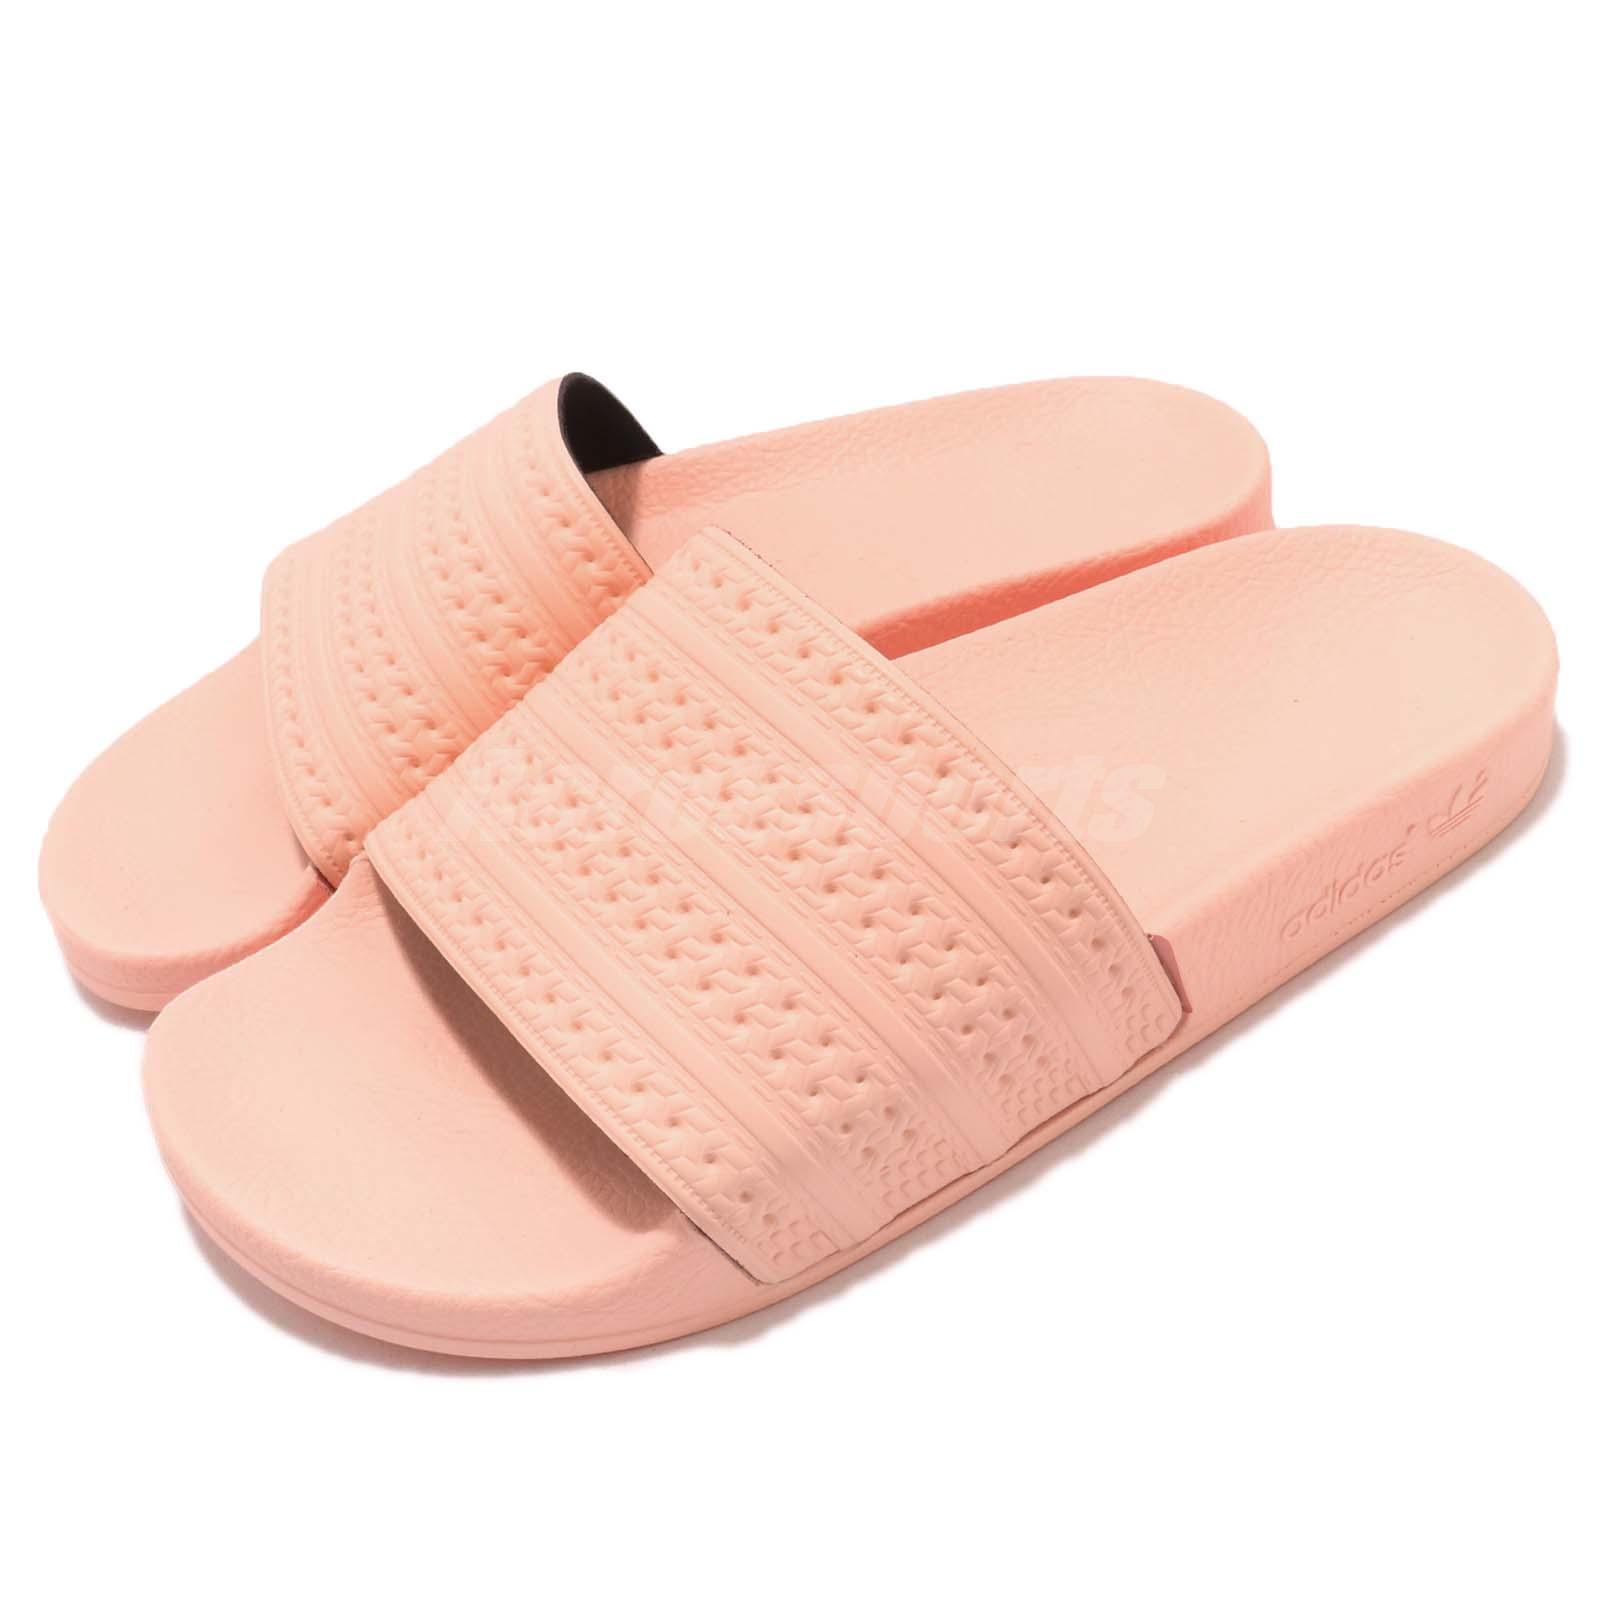 adidas Adilette Haze Coral Pink   WoHommes    Sports Sandal Slides Slippers BA7538 8cbebc